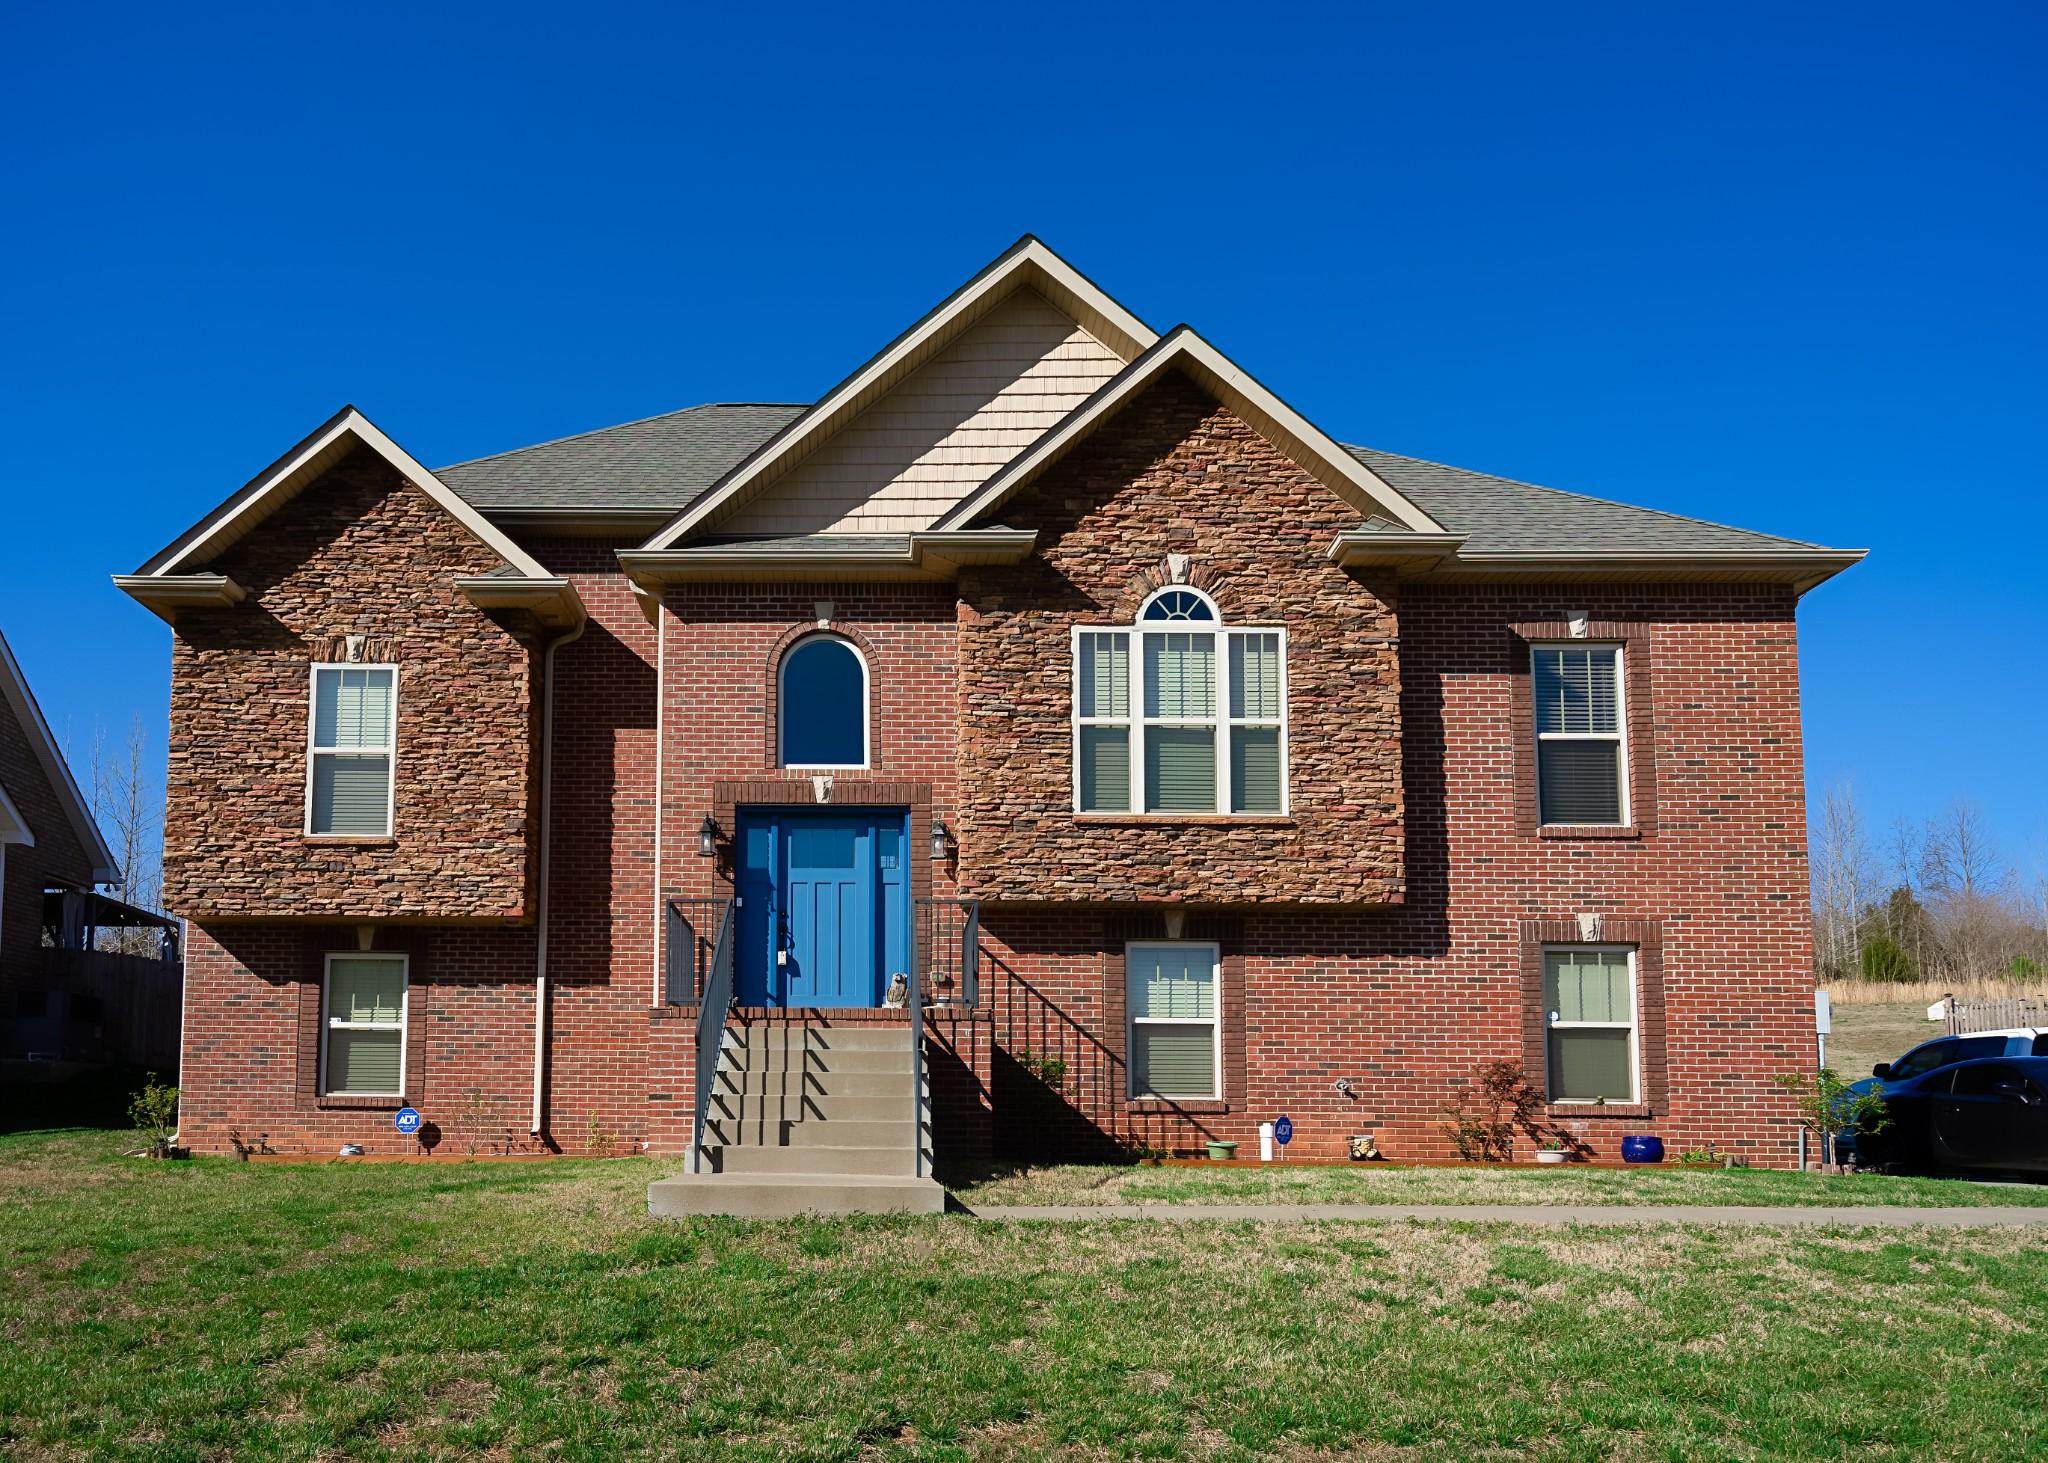 3515 Rabbit Run Trl Property Photo - Adams, TN real estate listing